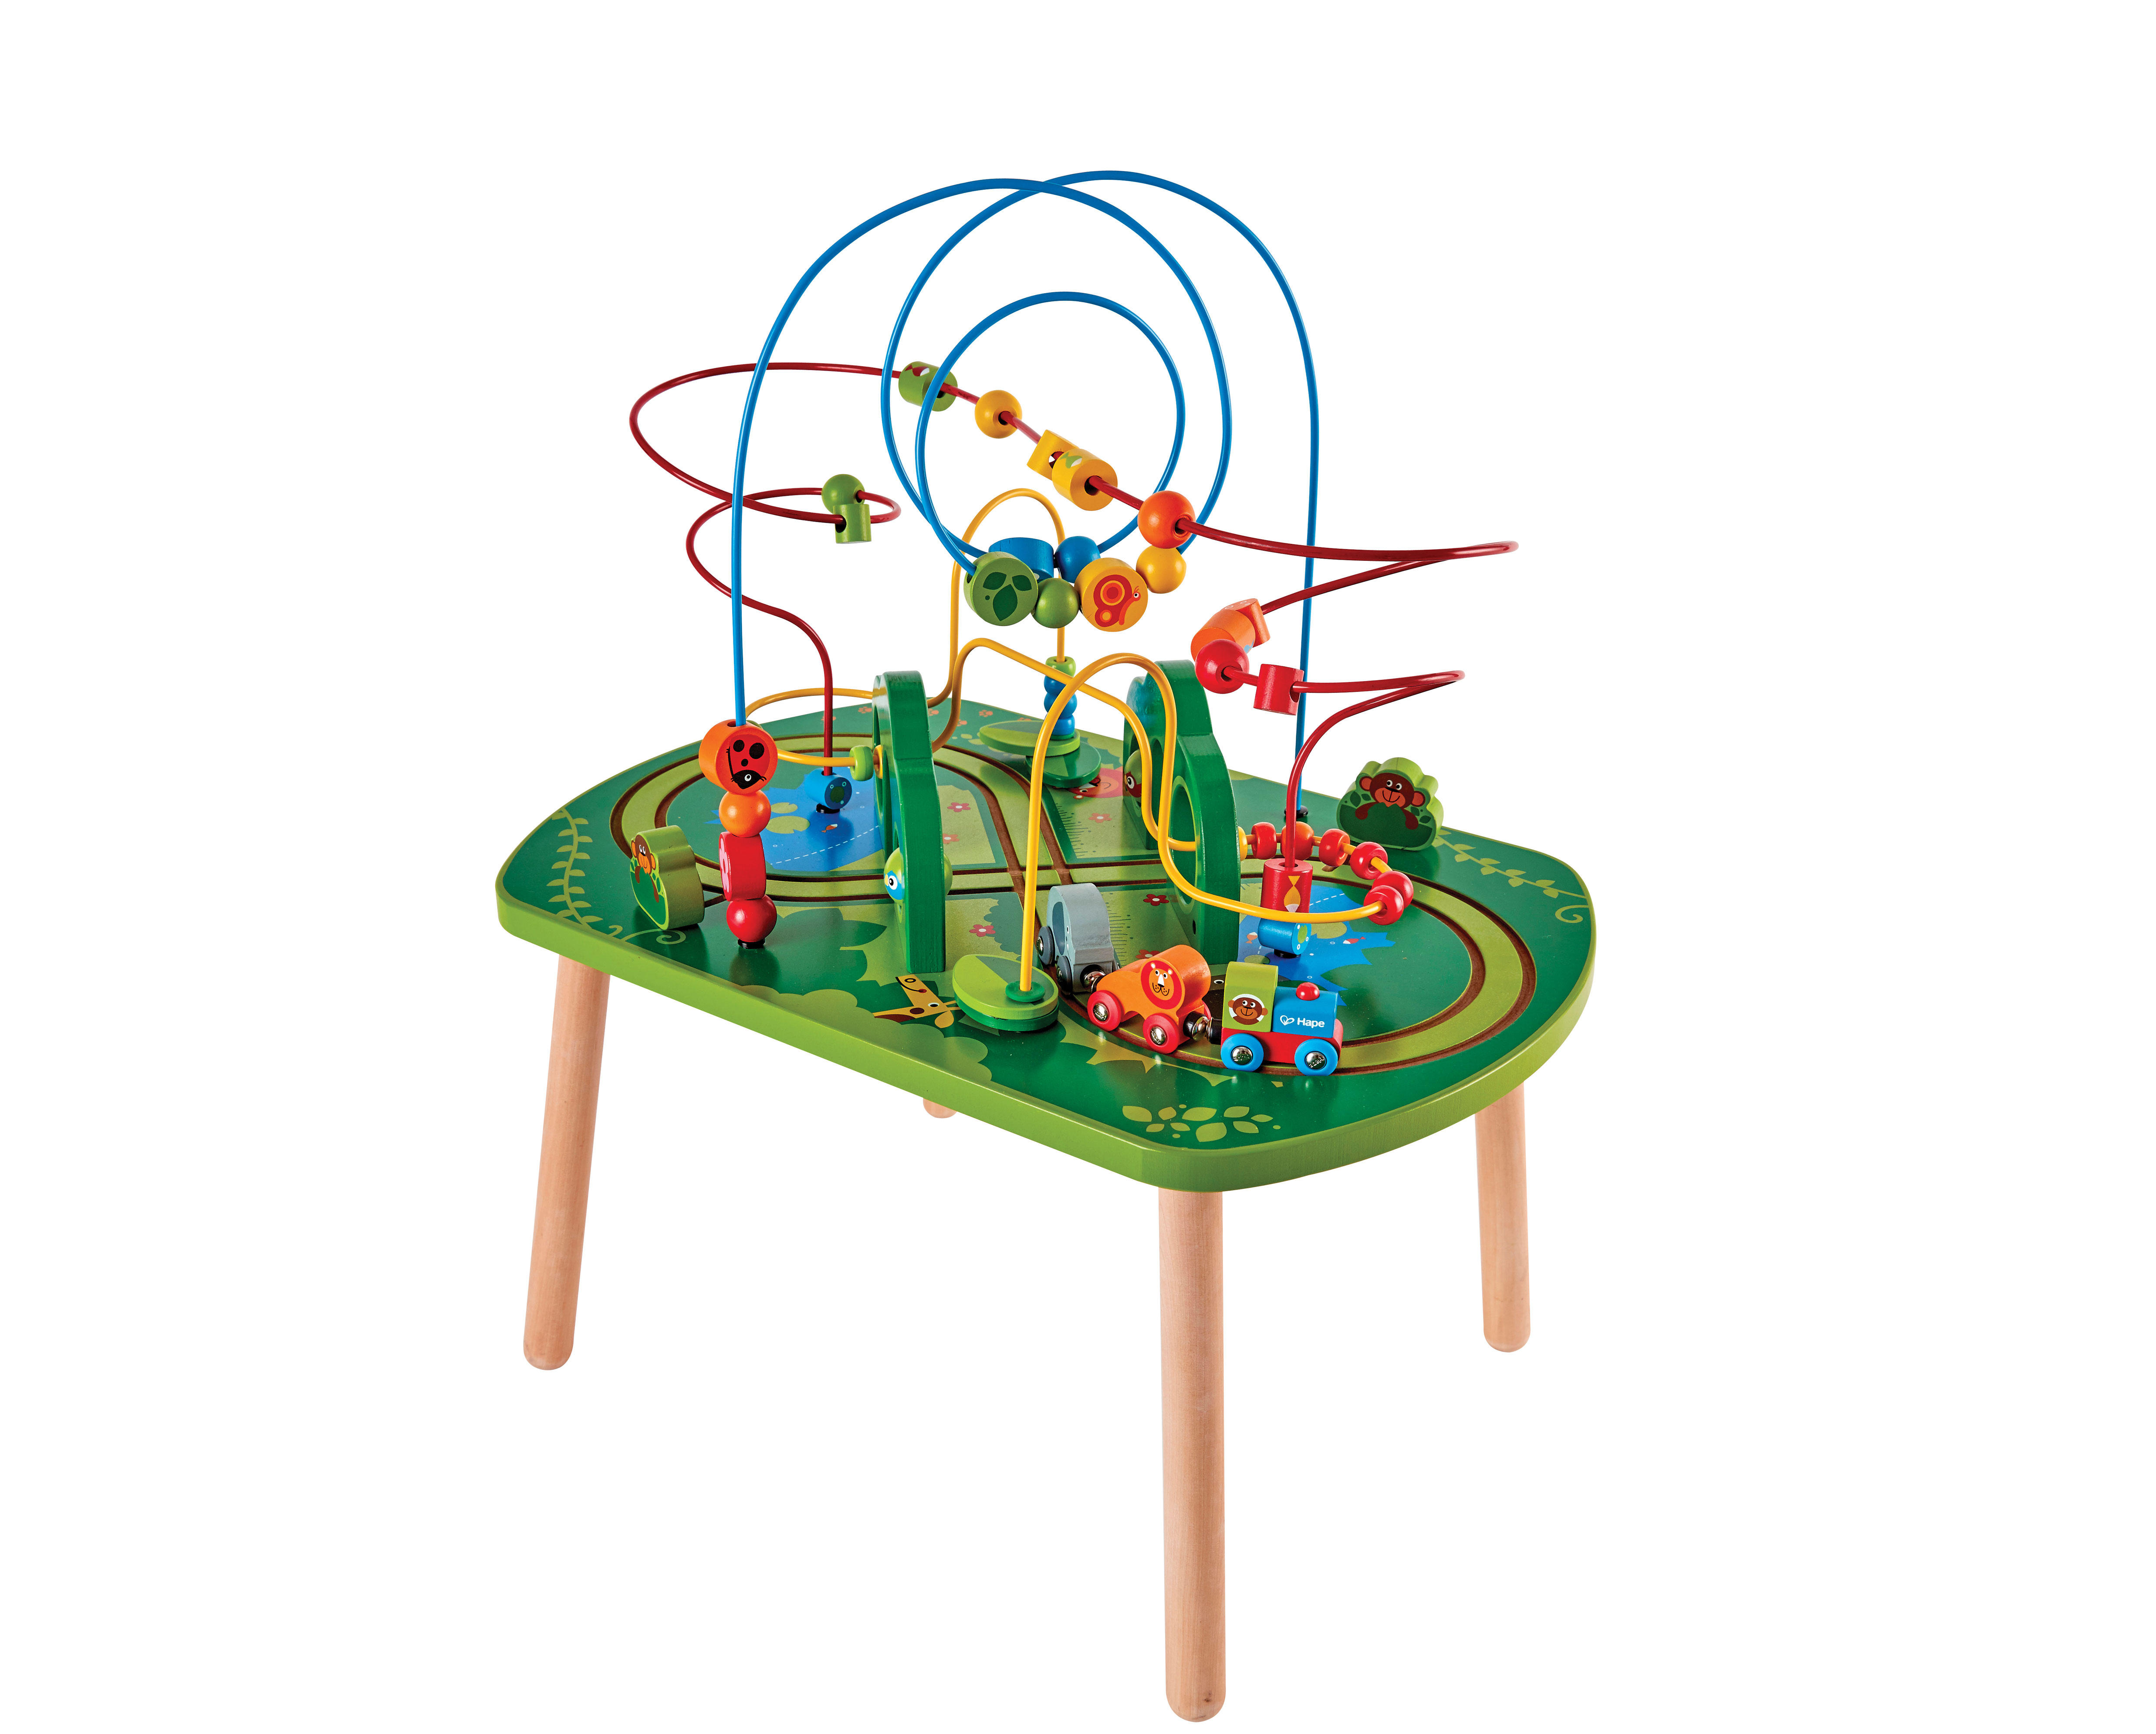 HAPE E3801 Jungle Play & Train Activity Table Wooden Toys ...